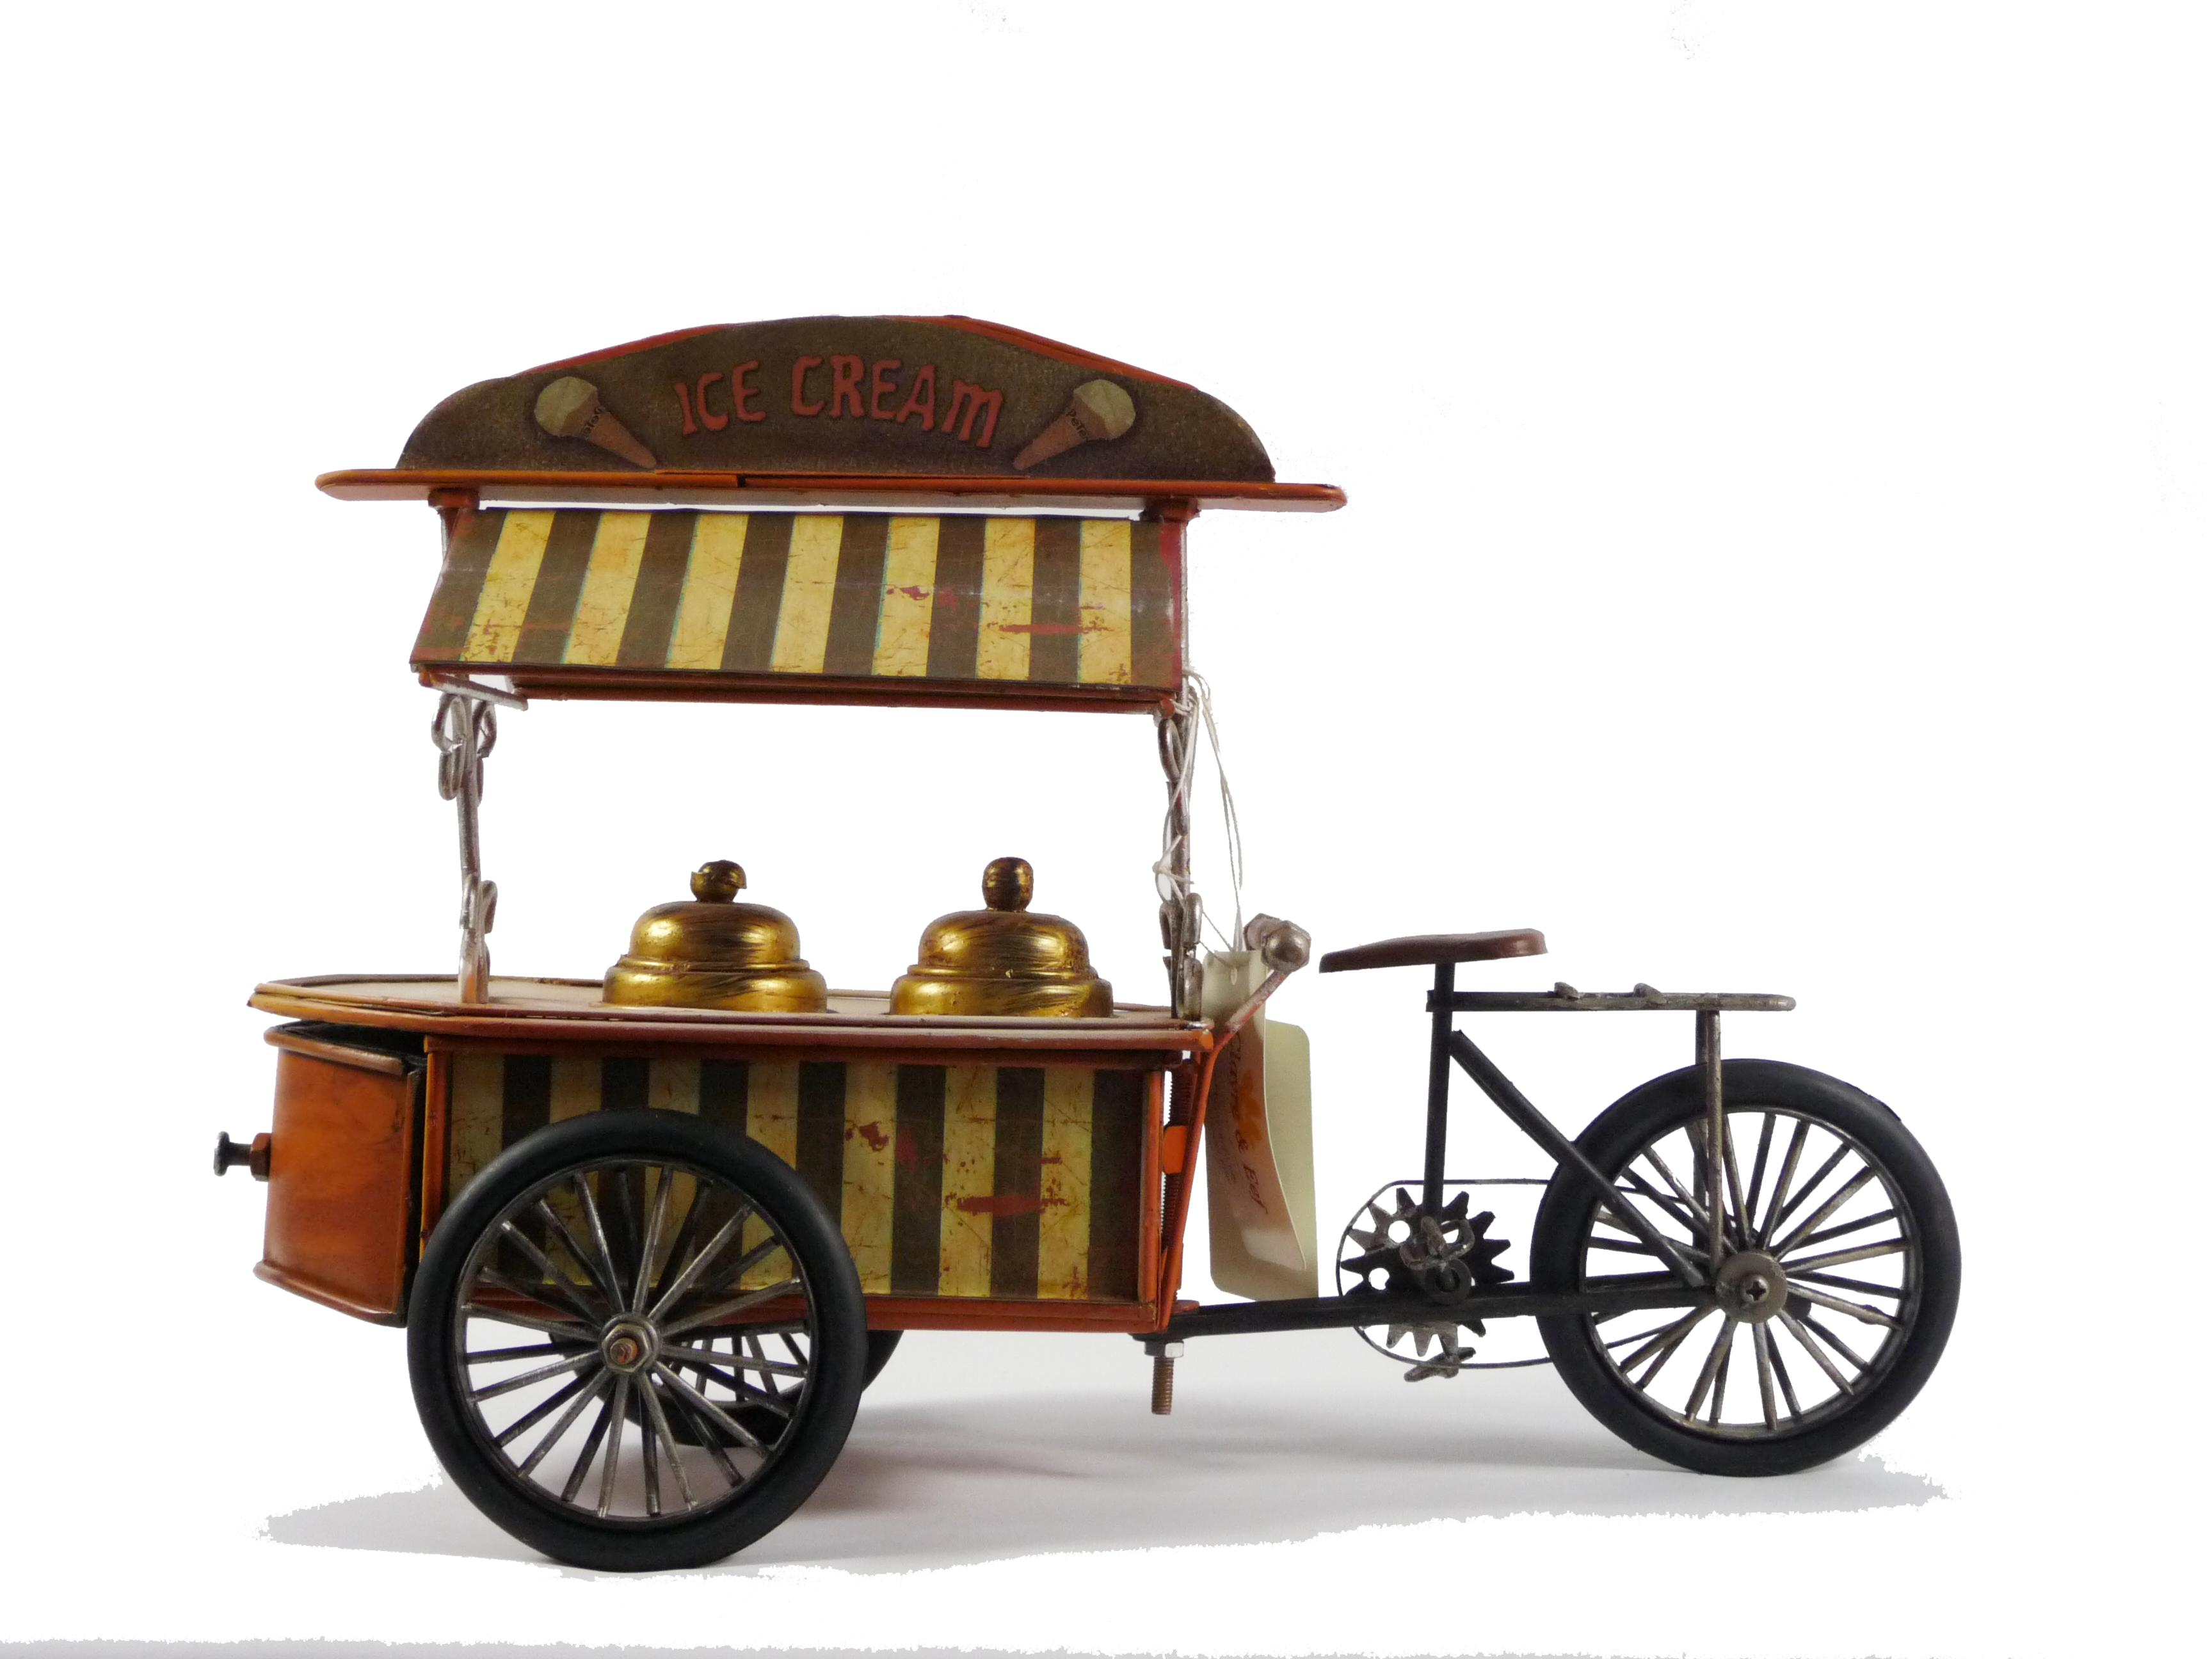 eisfahrrad blechmodell blechspielzeug metallmodell fahrrad. Black Bedroom Furniture Sets. Home Design Ideas